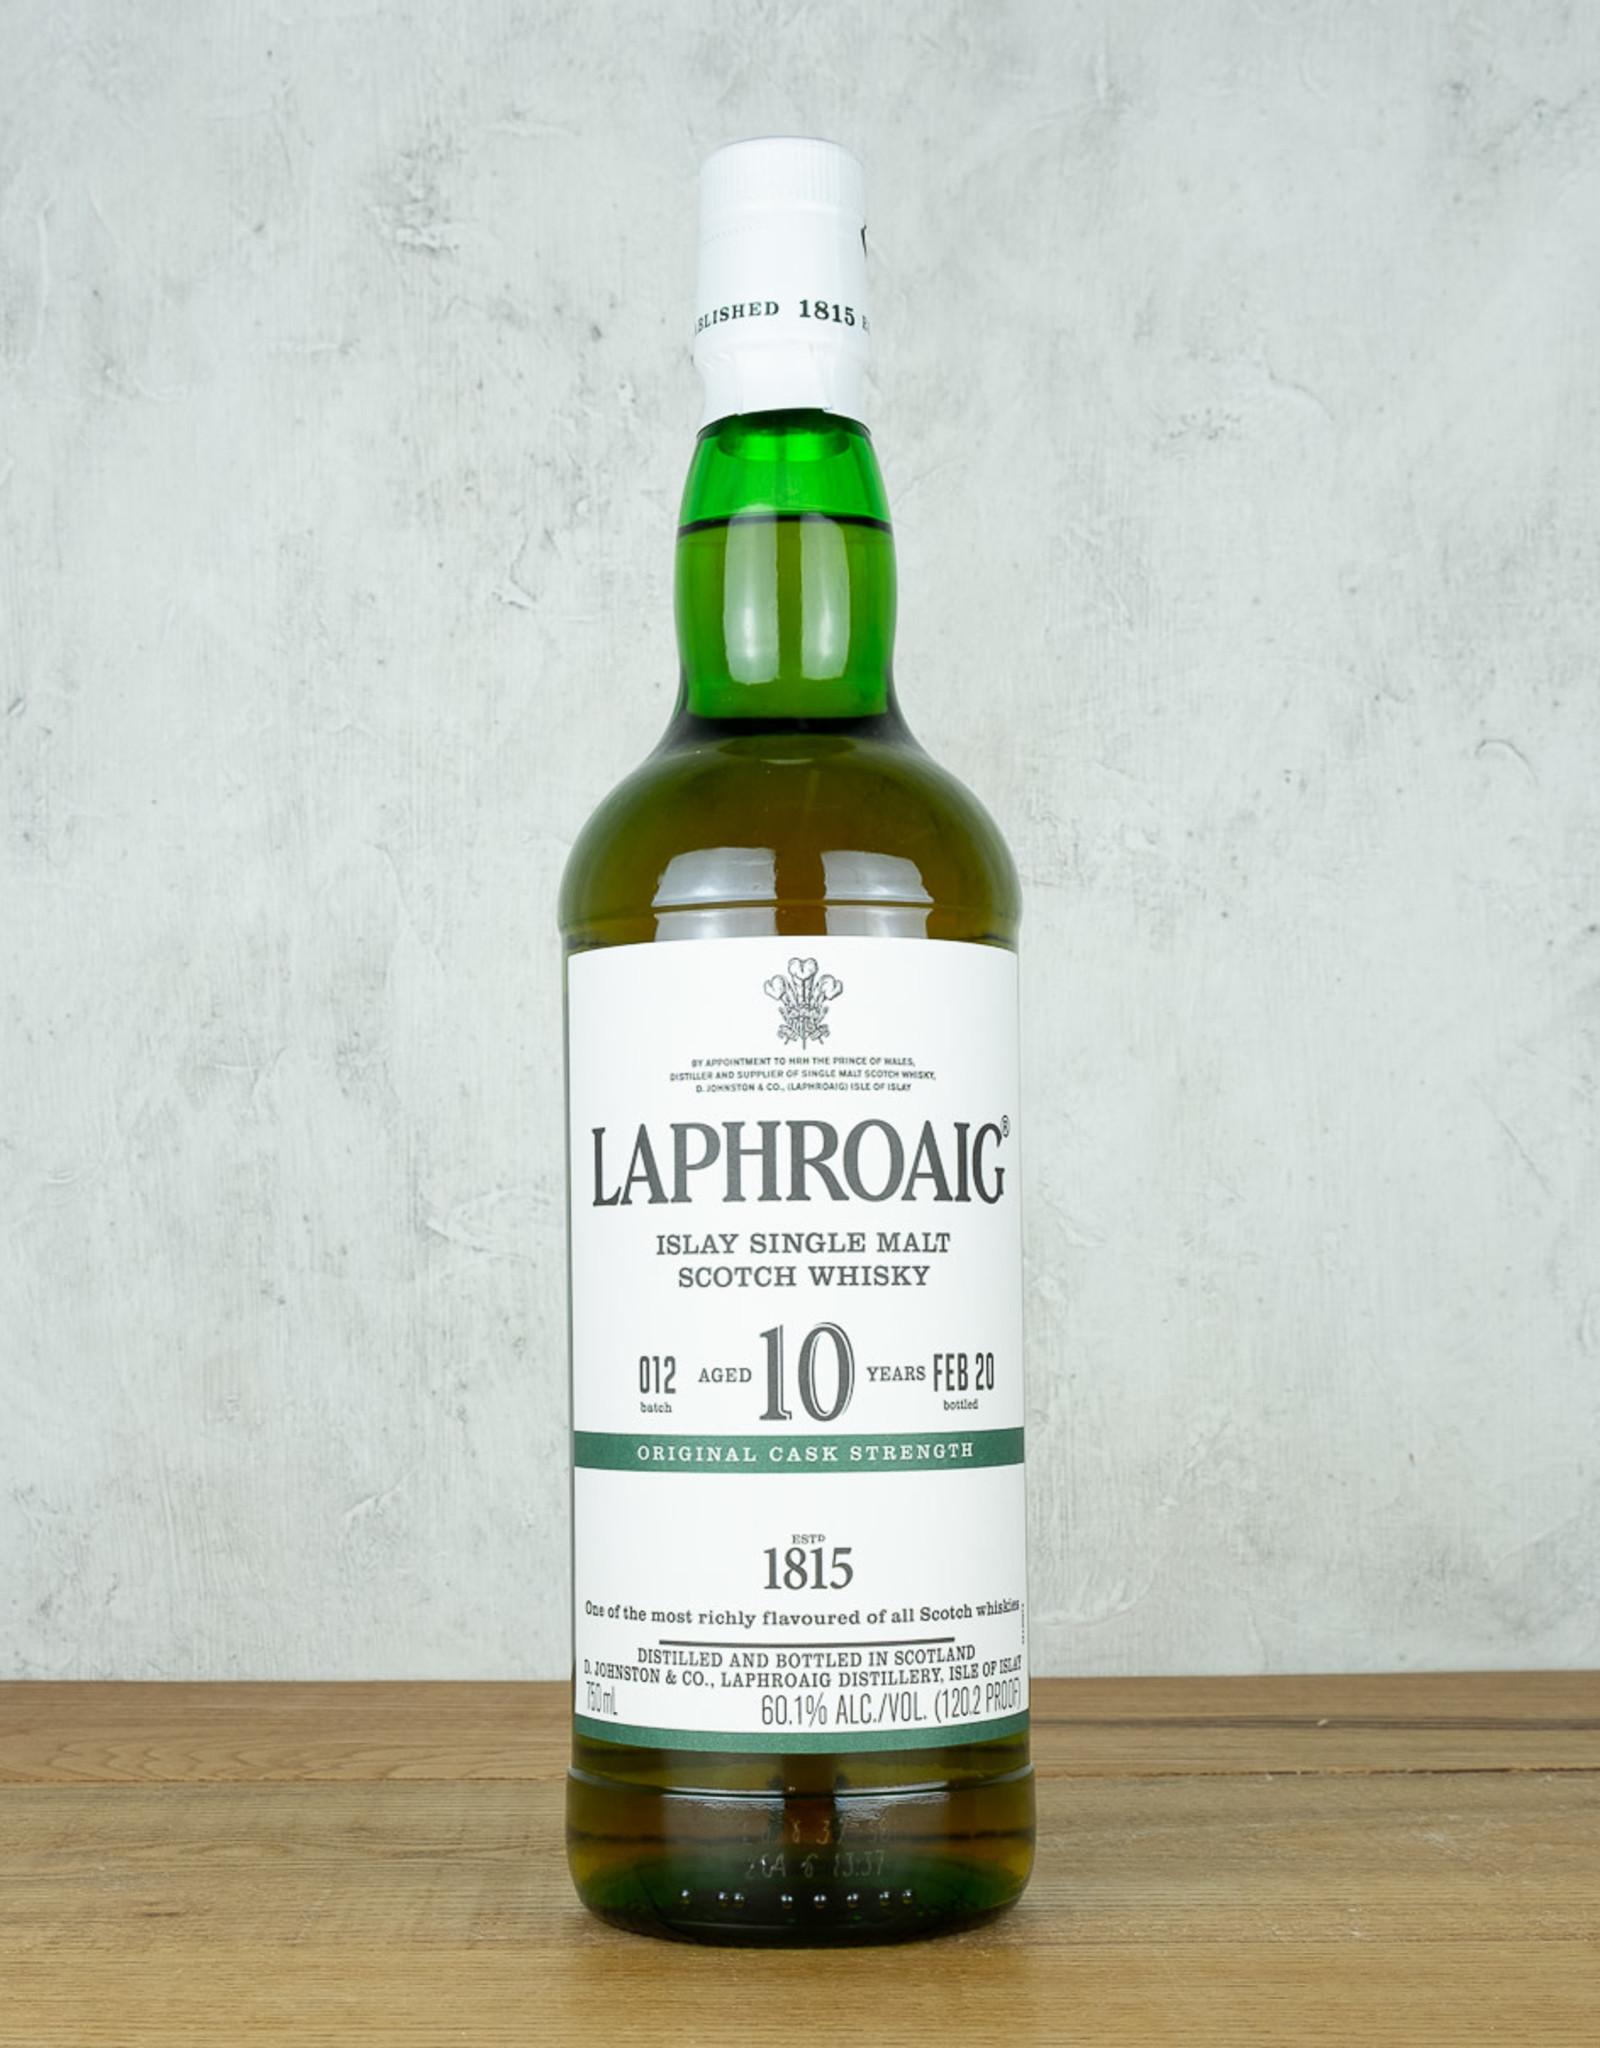 Laphroaig 10 Year Cask Strength Single Malt Scotch Whisky